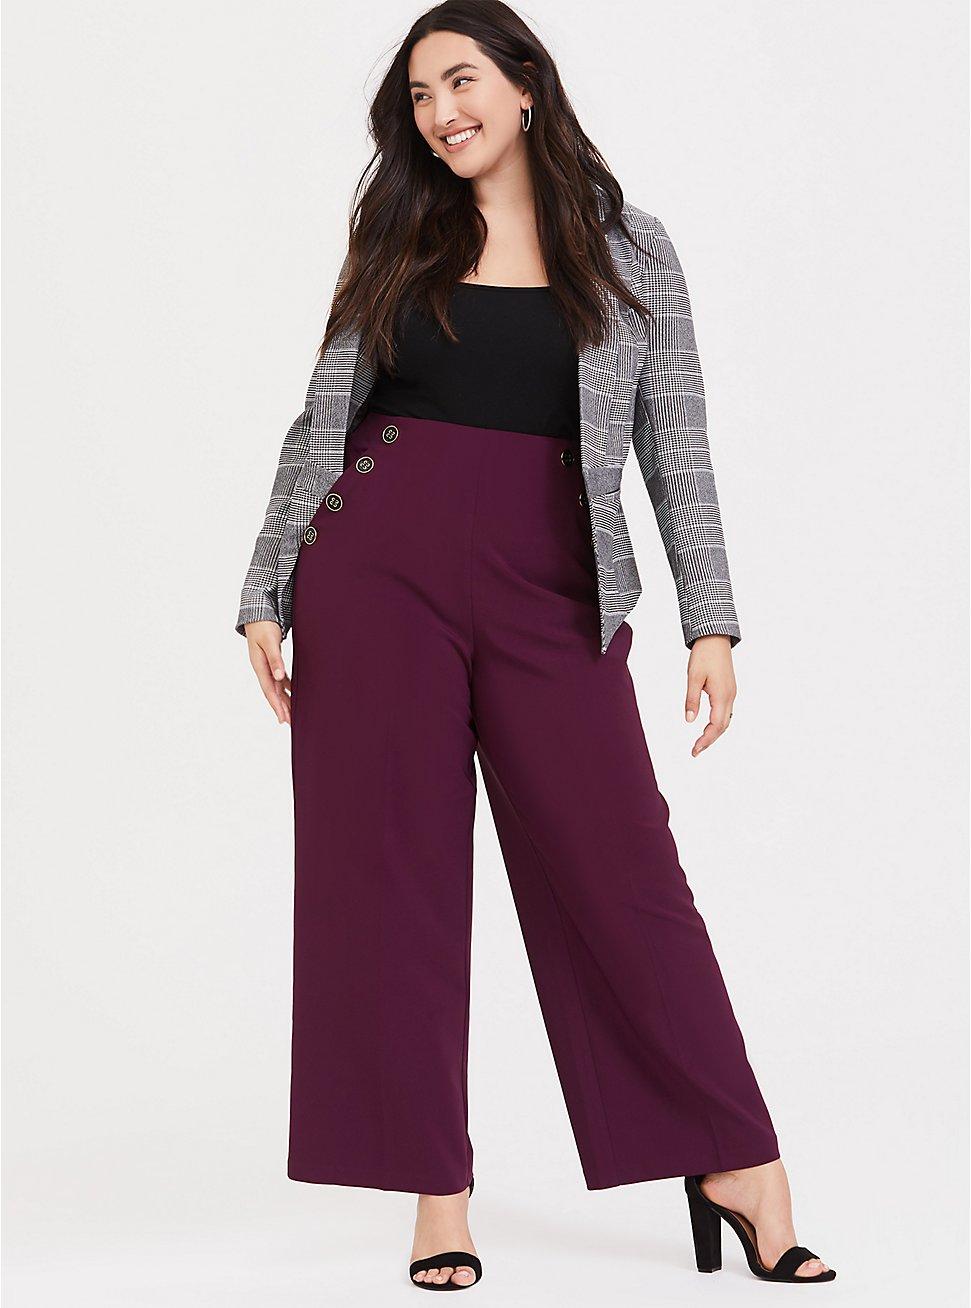 High Waisted Sailor Pant – Burgundy Purple, HIGHLAND THISTLE, hi-res